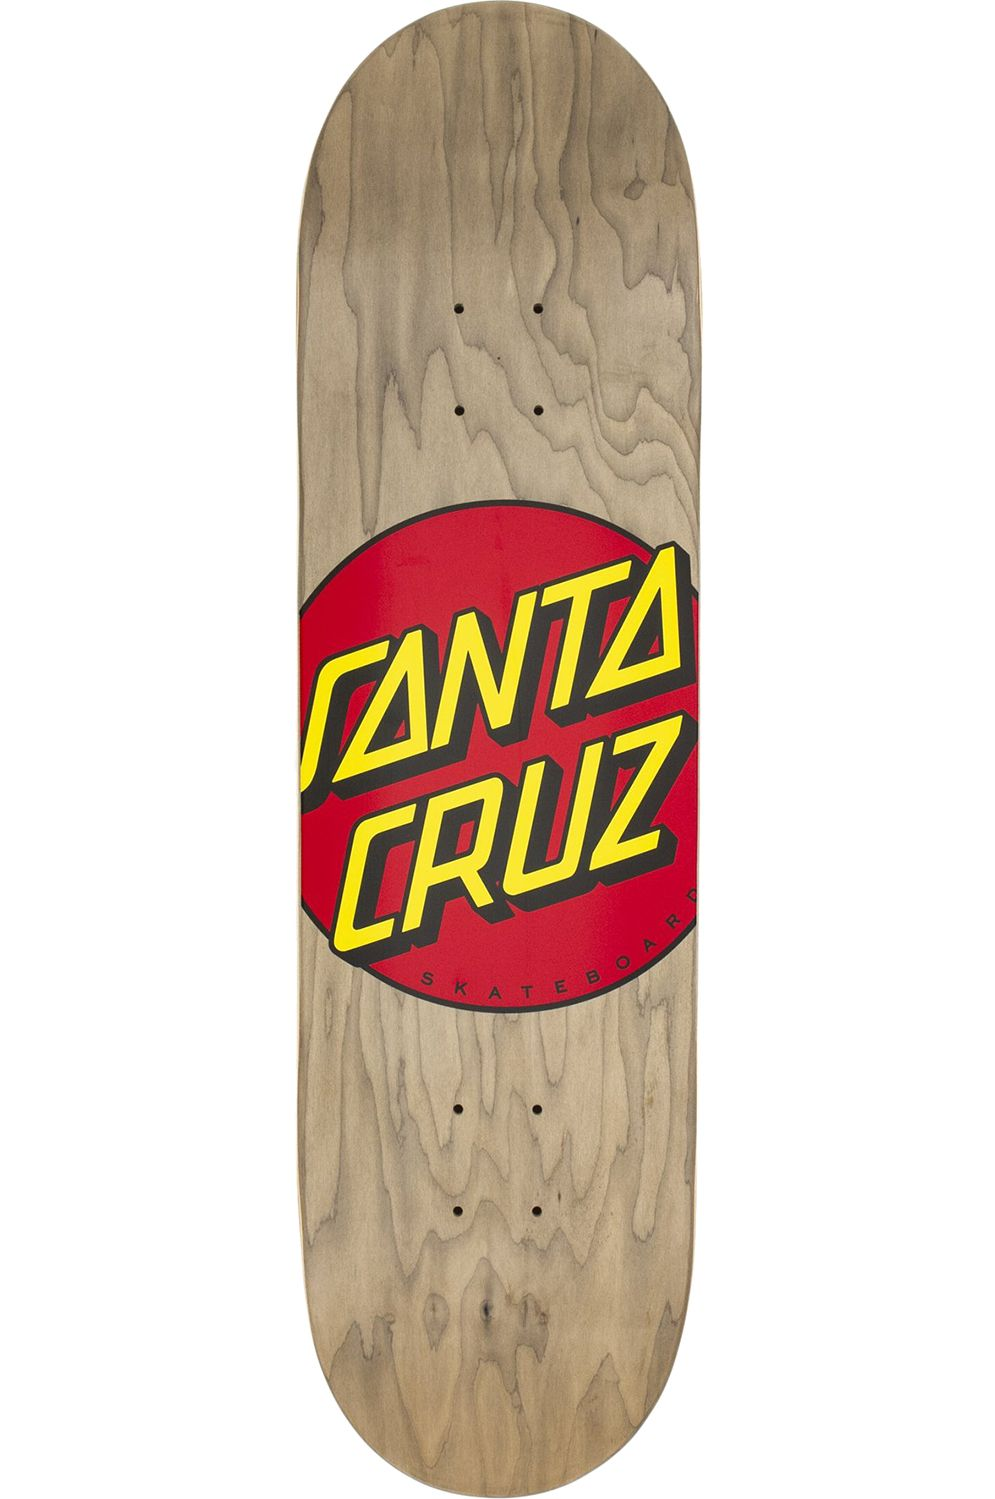 "Tabua Santa Cruz 8.375"" x 31.83"" CLASSIC DOT Assorted"